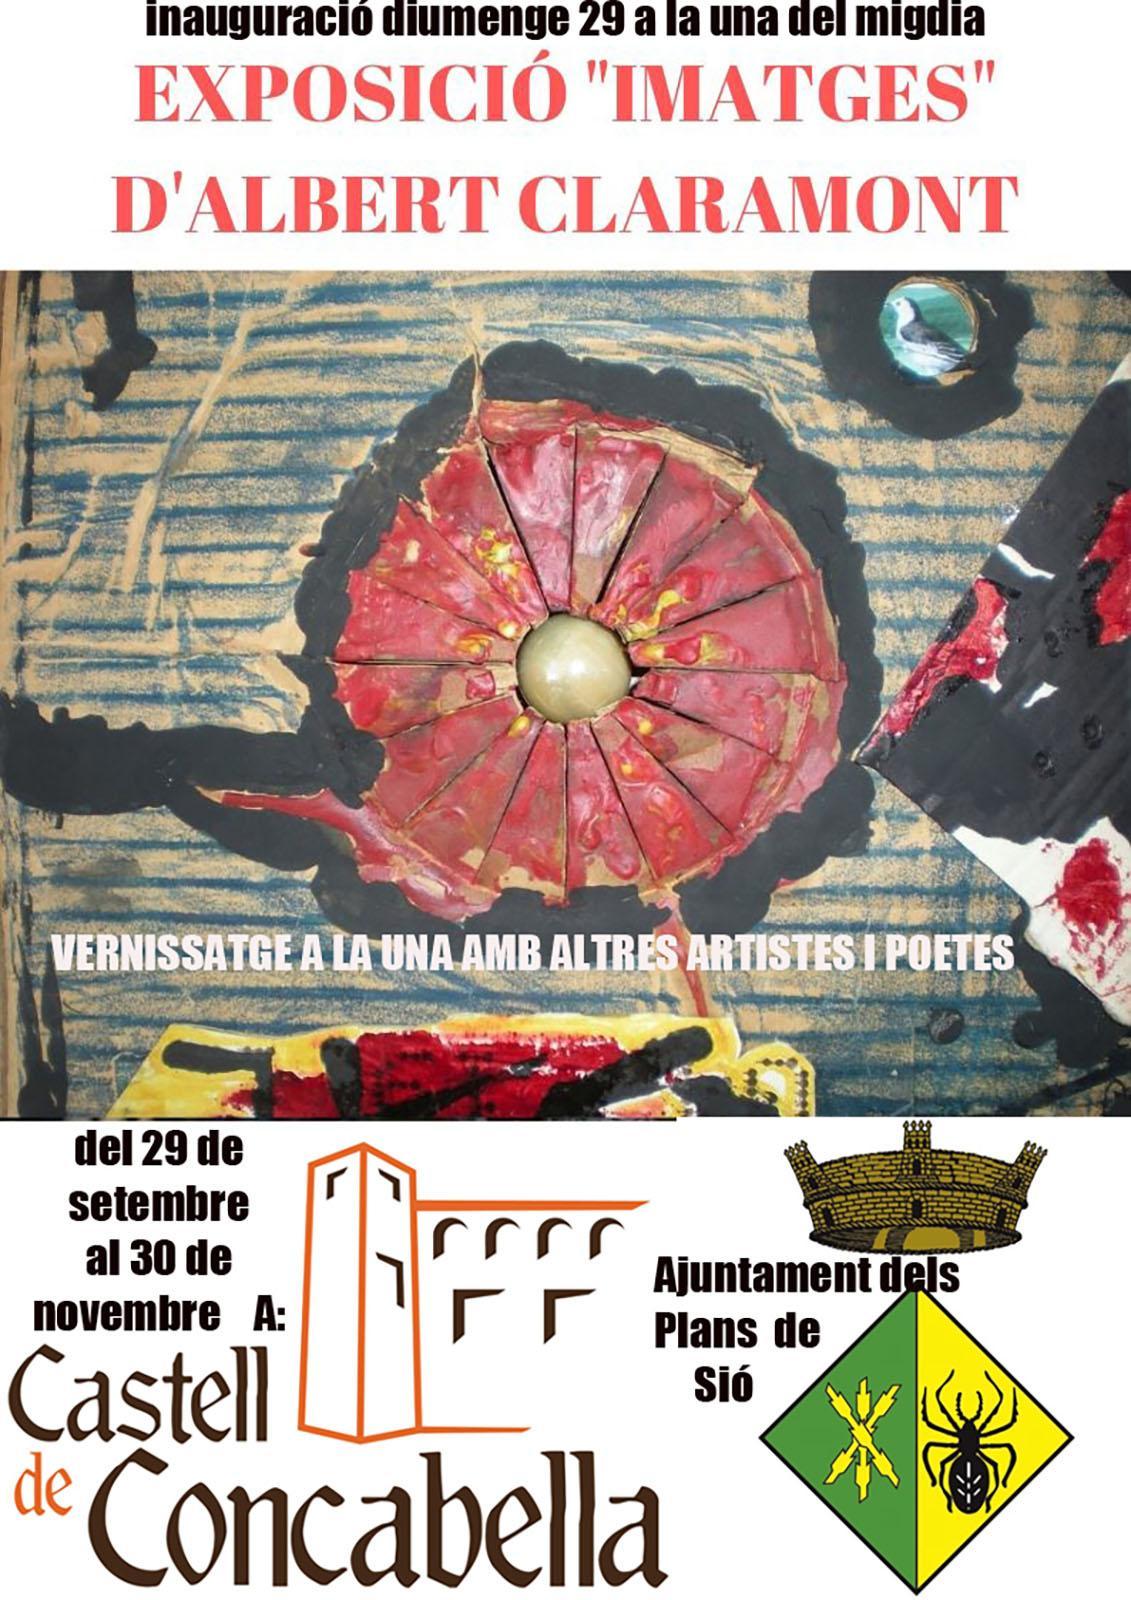 cartell Exposició 'Imatges' d'Albert Claramont